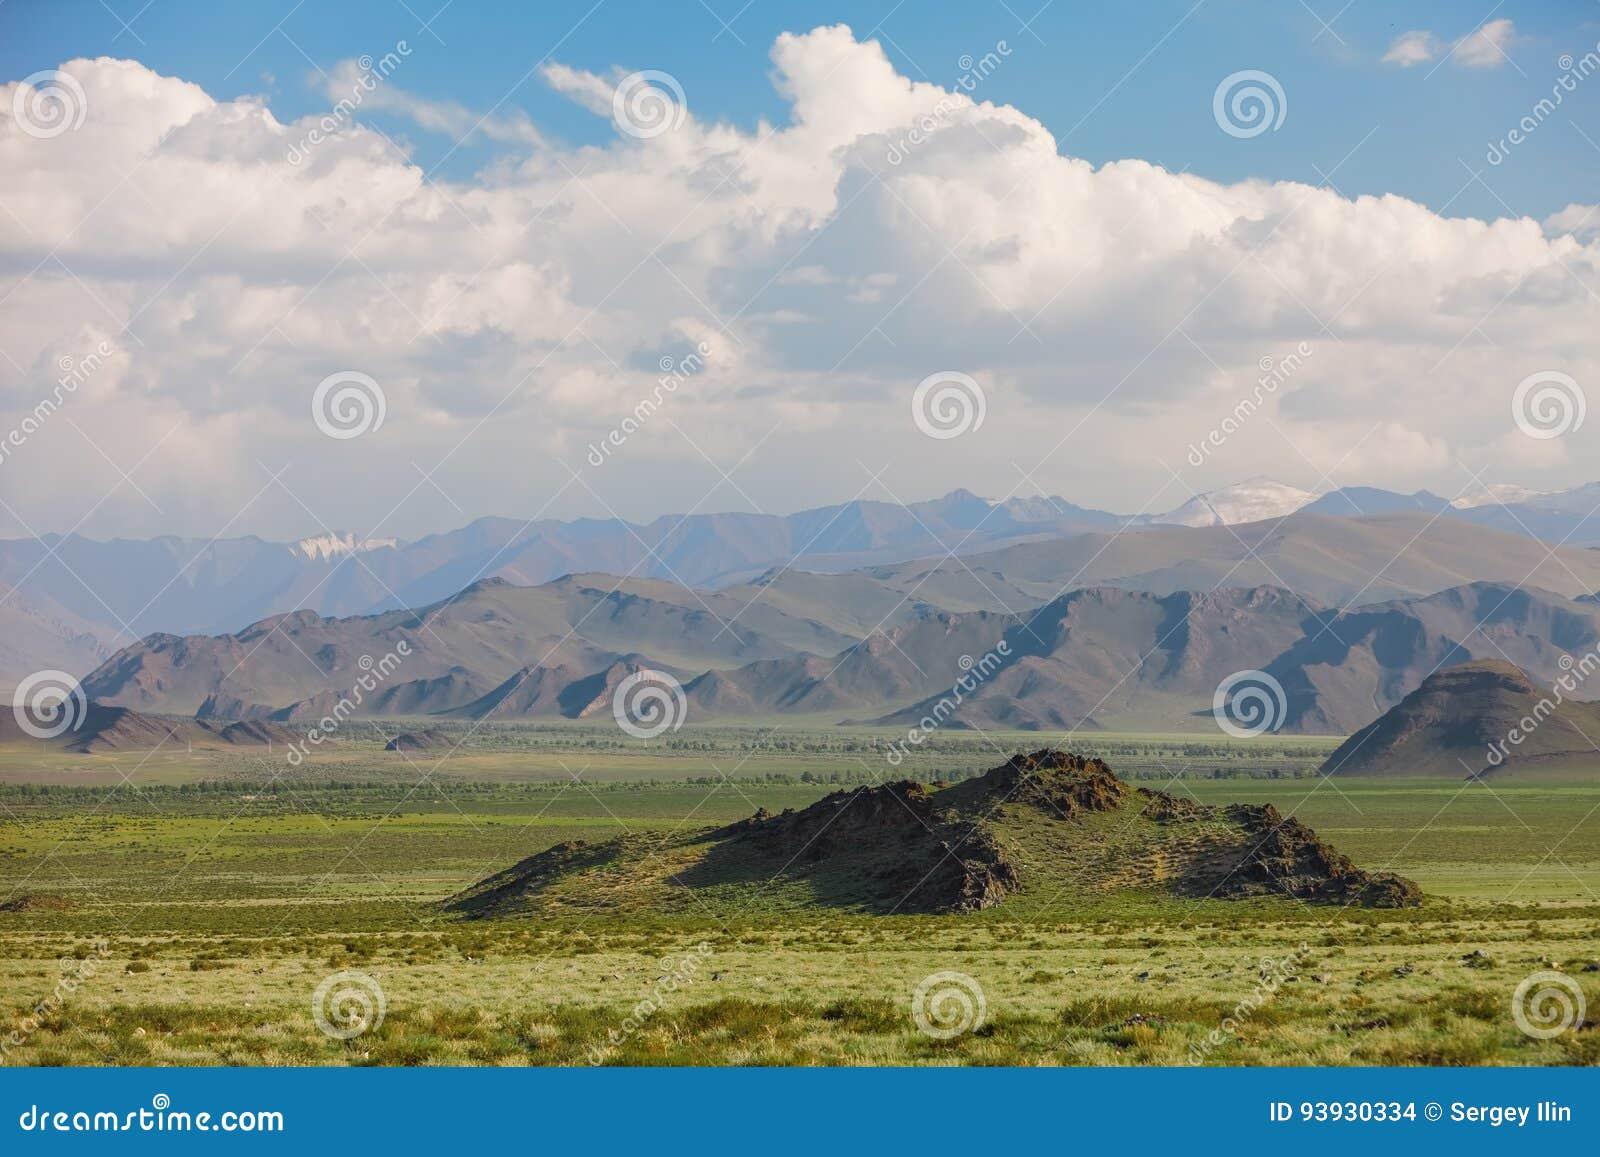 altai-mountains-beautiful-highland-lands